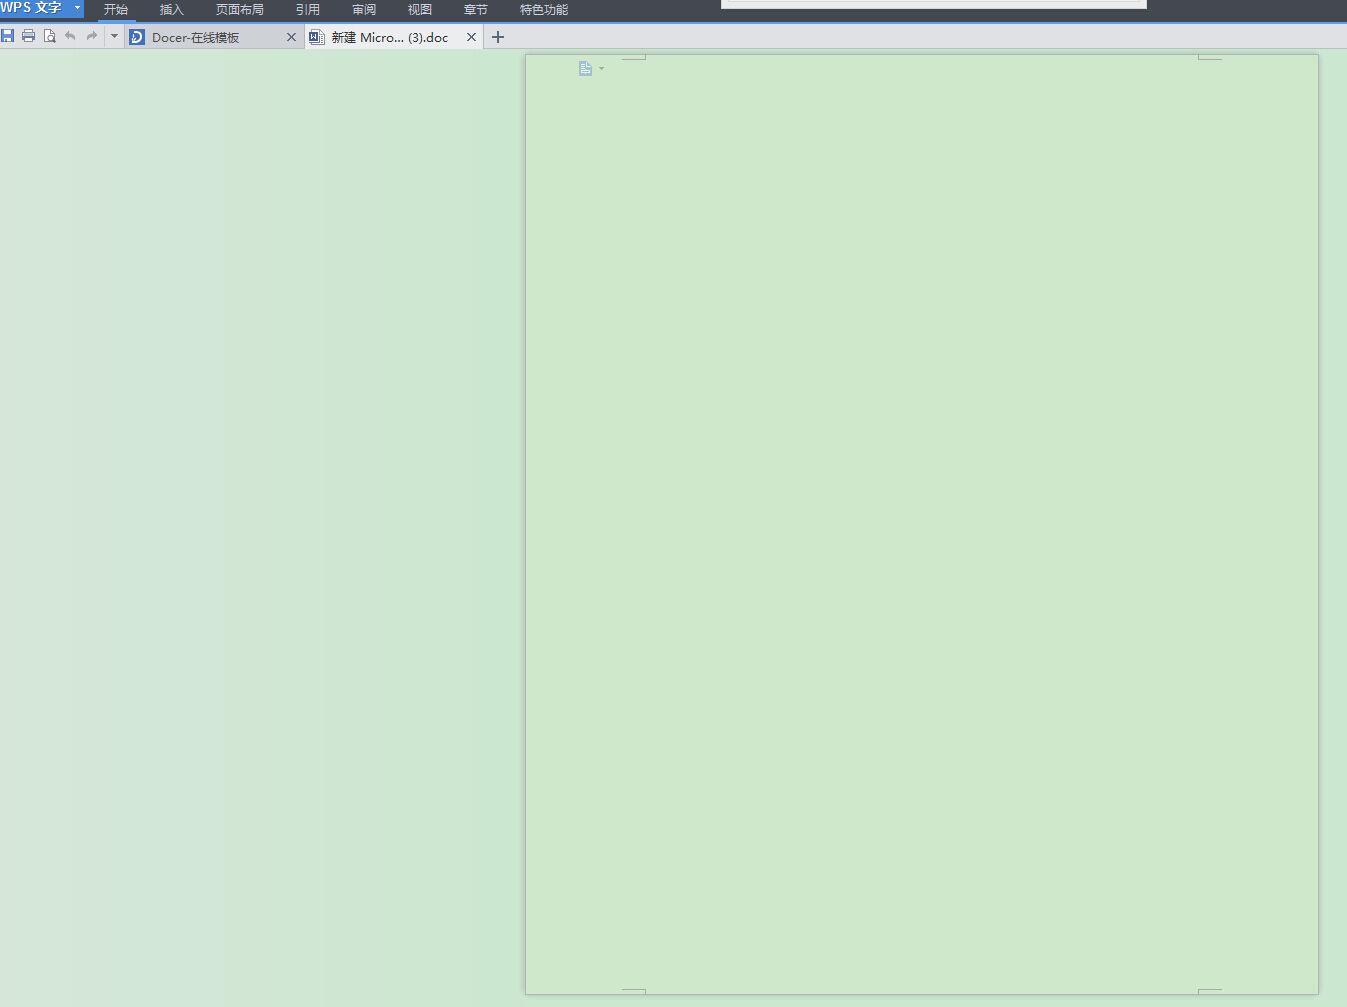 wpsword页面怎么变成这样了图片